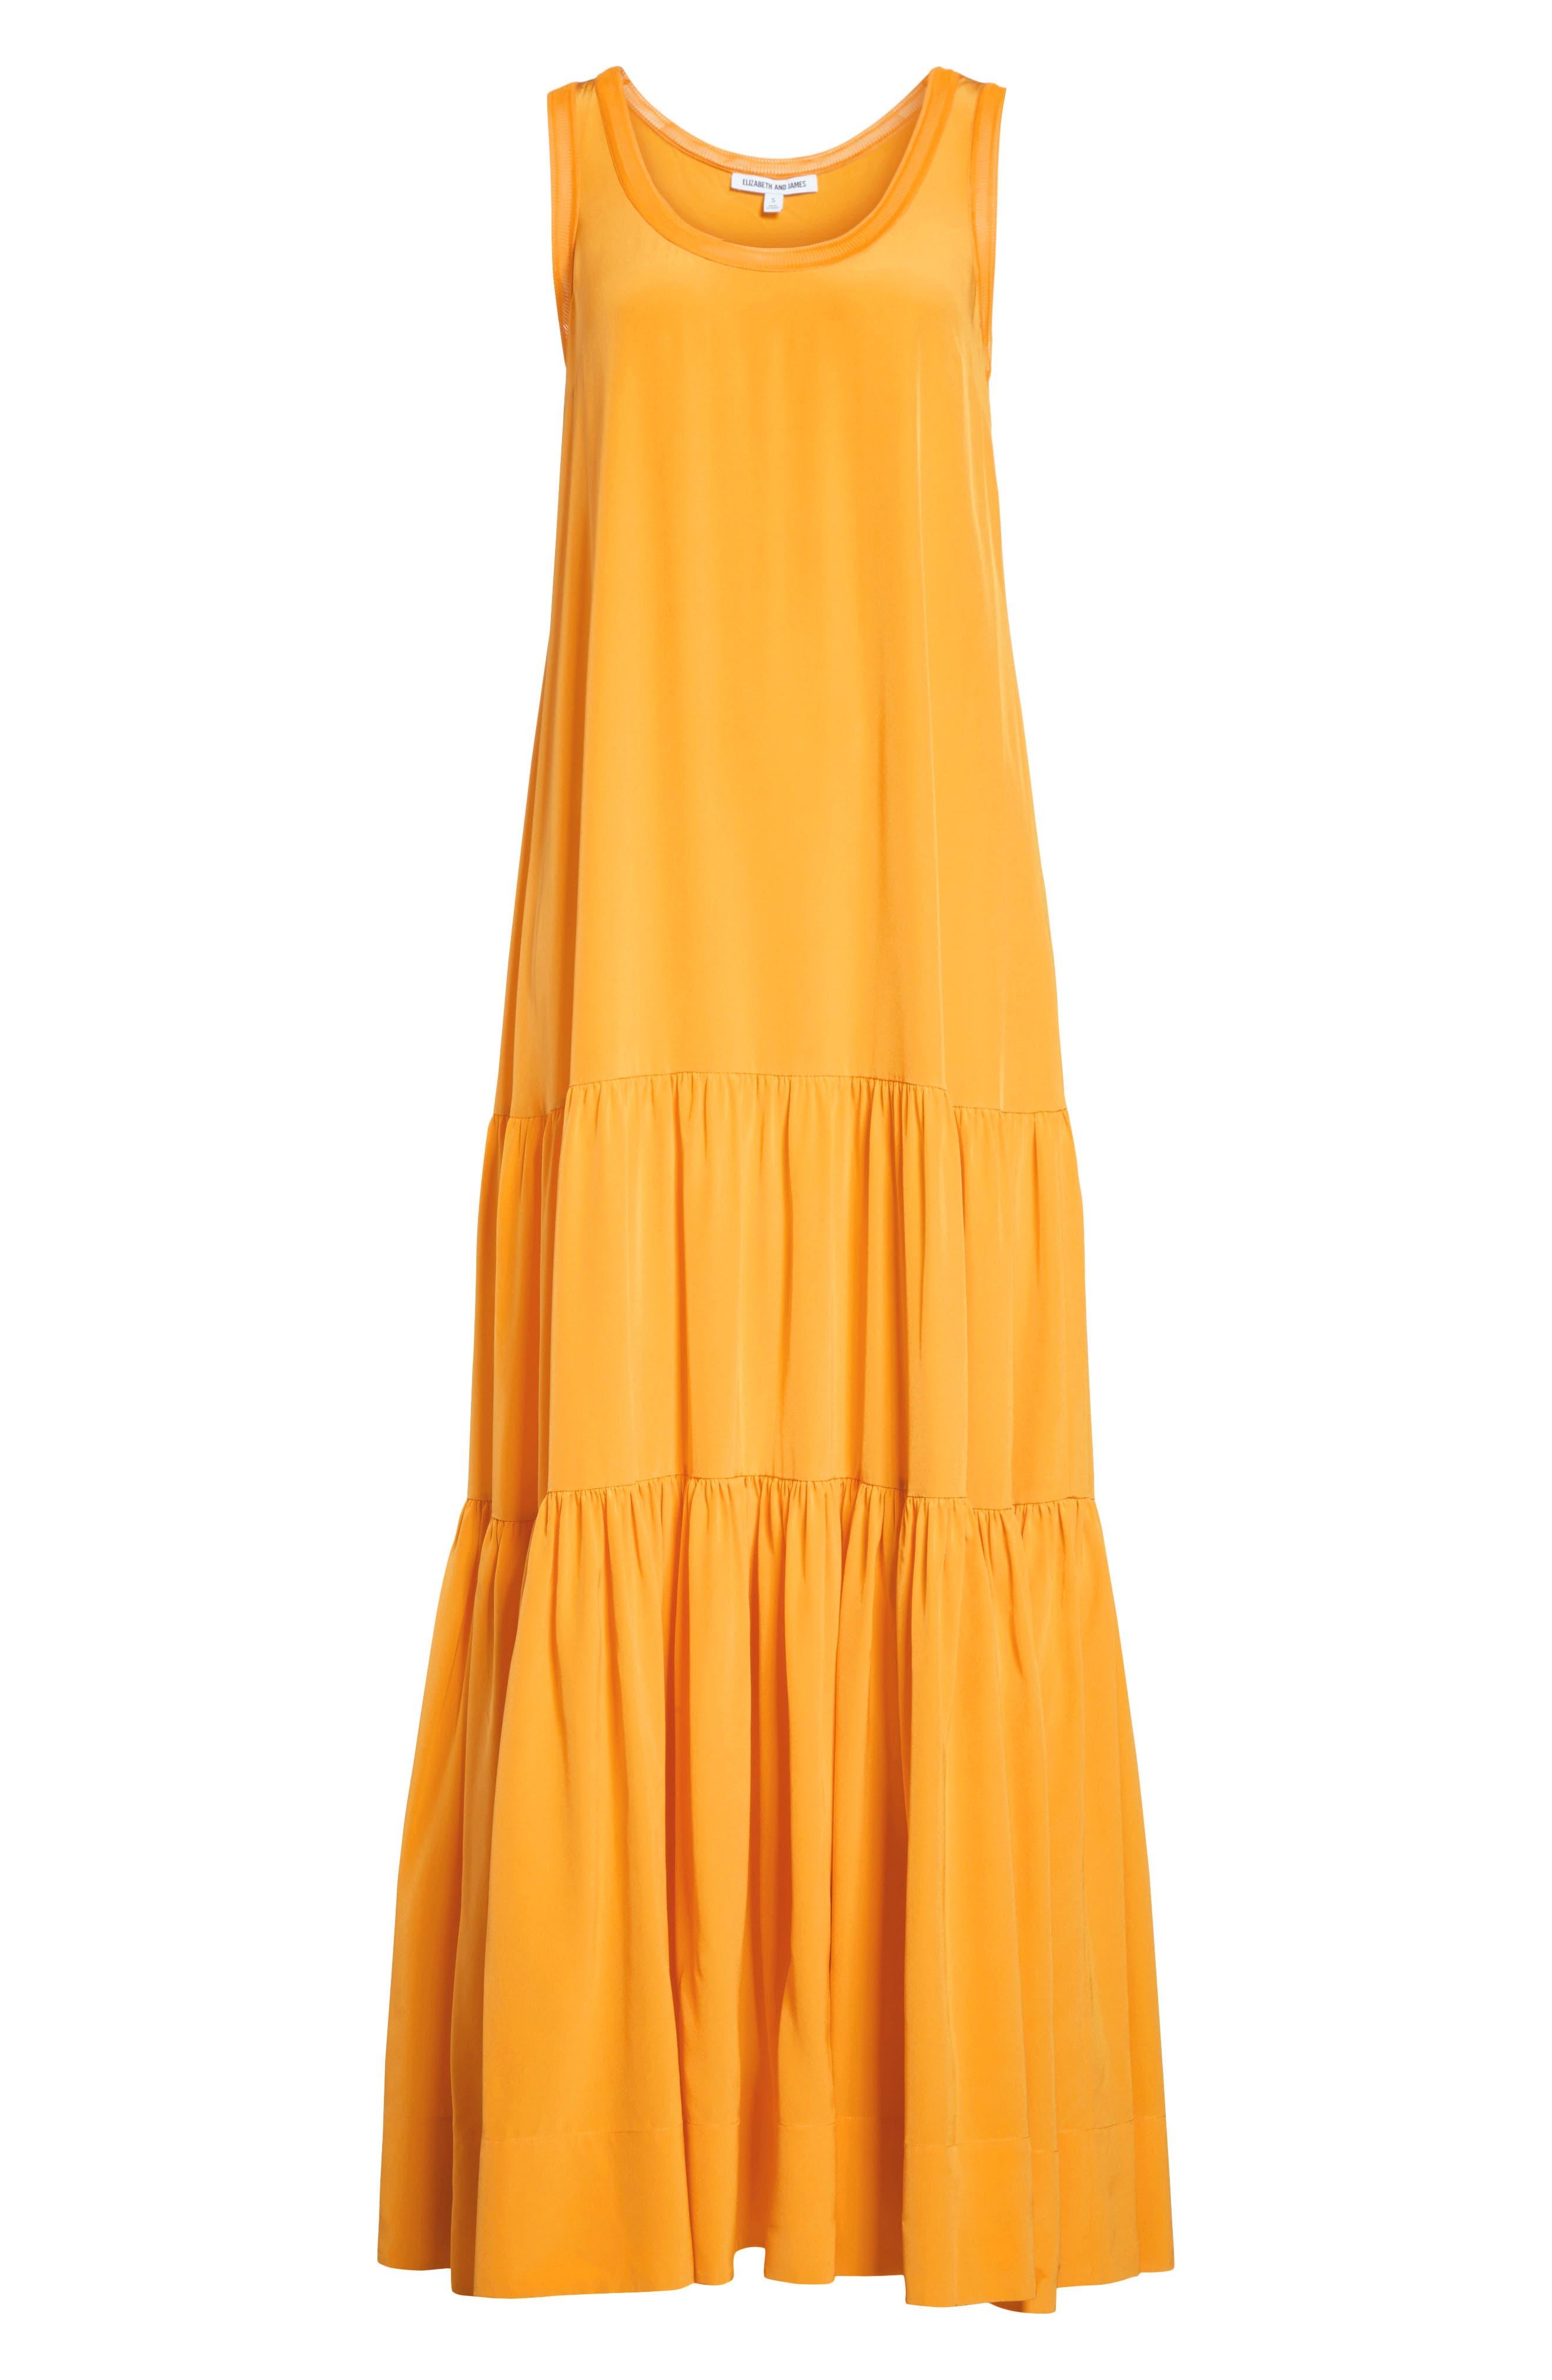 Hazel Silk Tank Dress,                             Alternate thumbnail 7, color,                             706